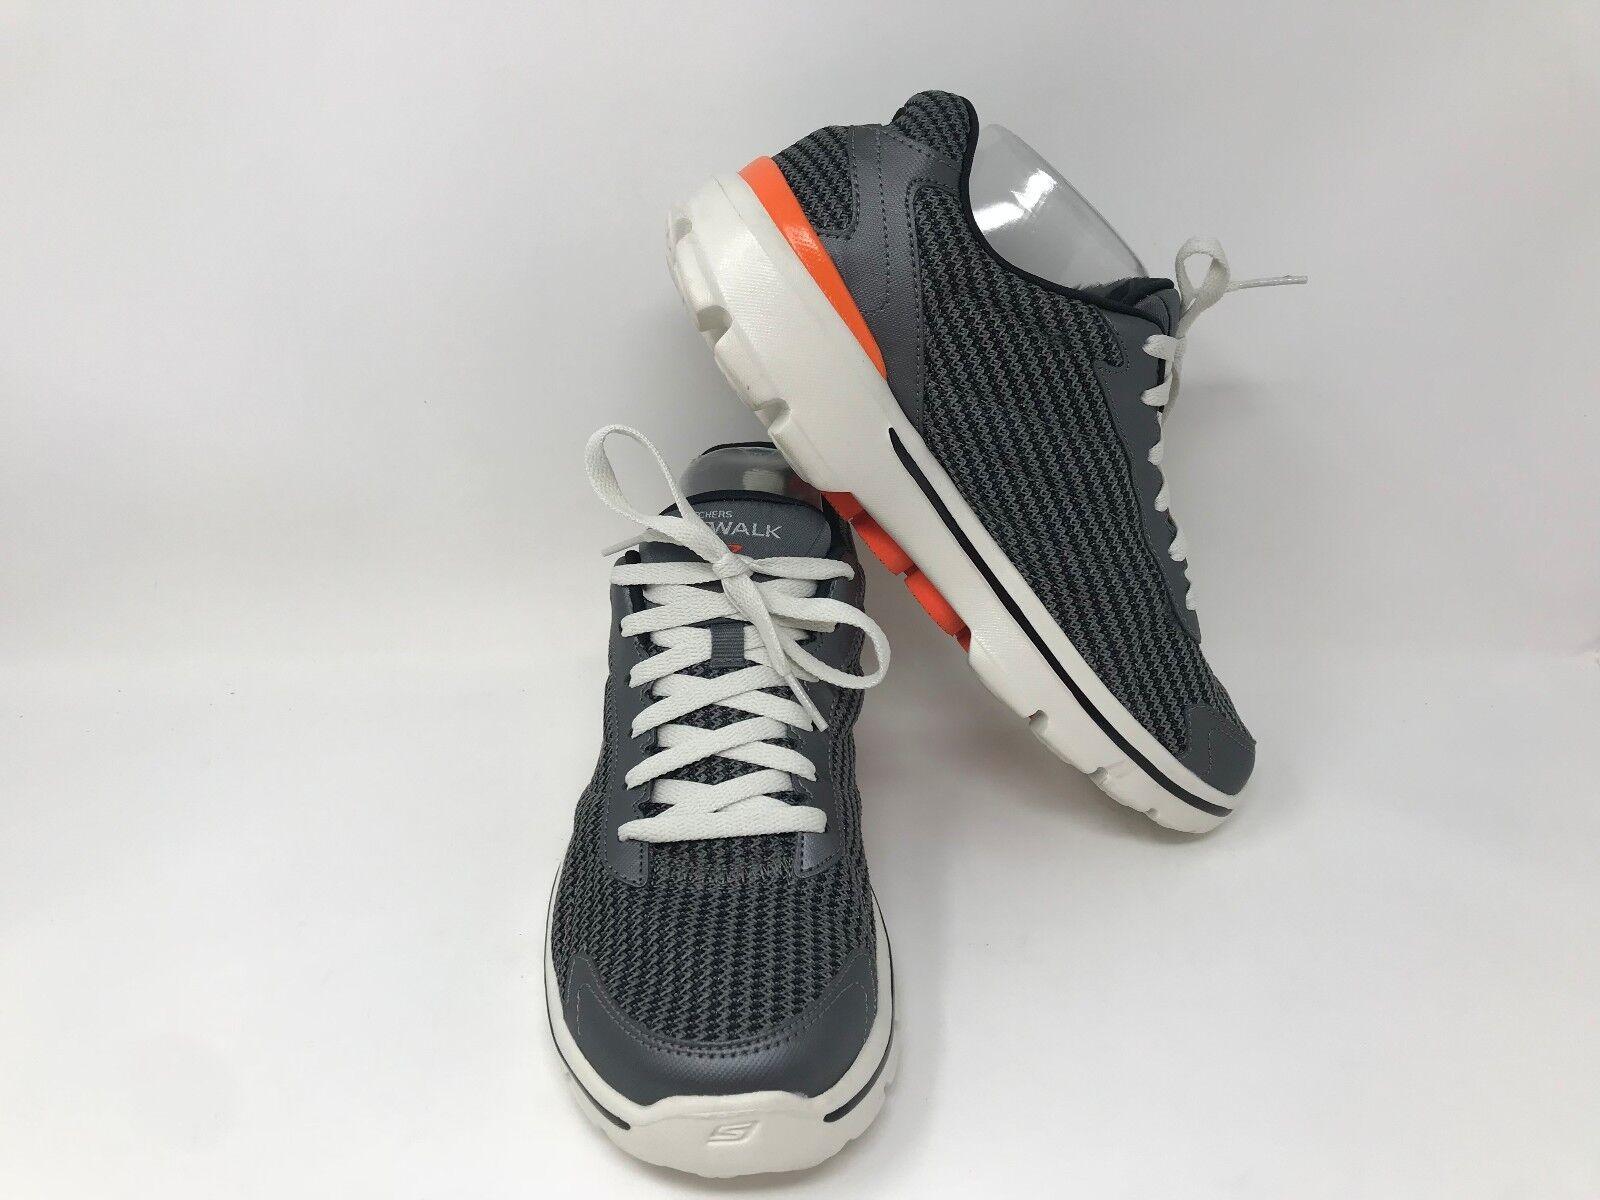 New! Men's Skechers 53981 Go Walk Fitknit 2 - Gharcoal/Orange J19 Brand discount